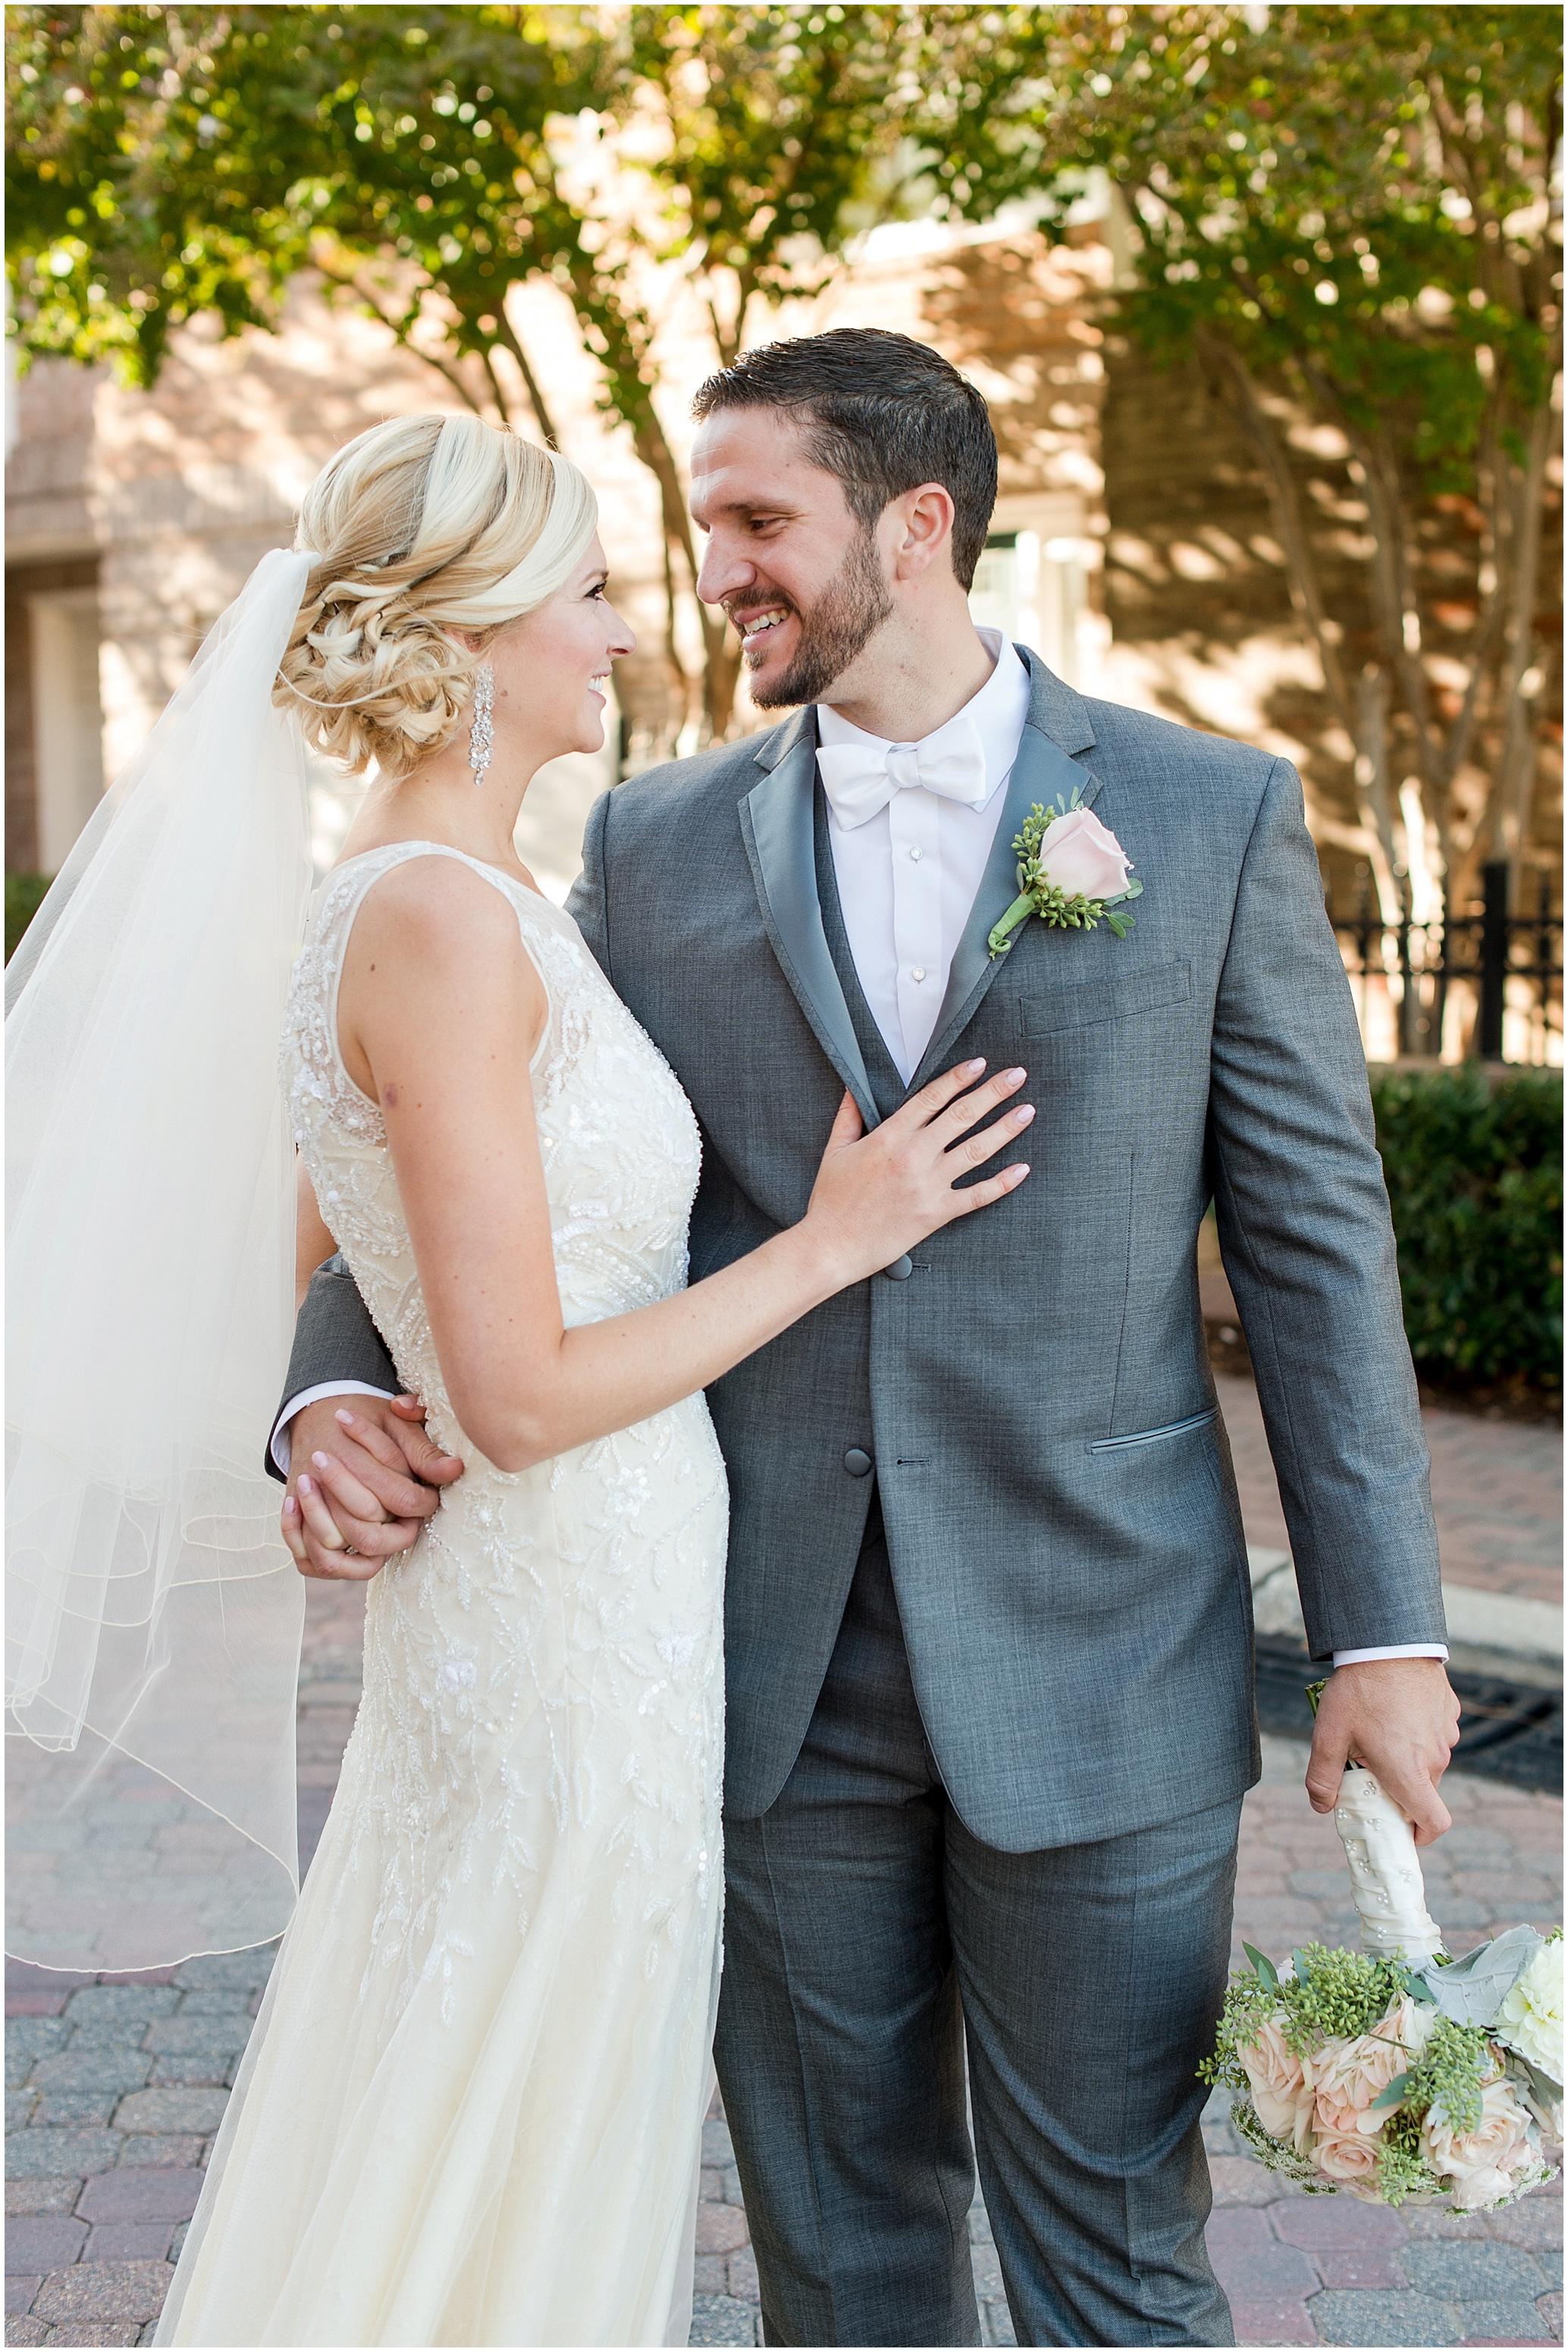 Hannah Leigh Photography Tabrizis Baltimore Wedding_2222.jpg